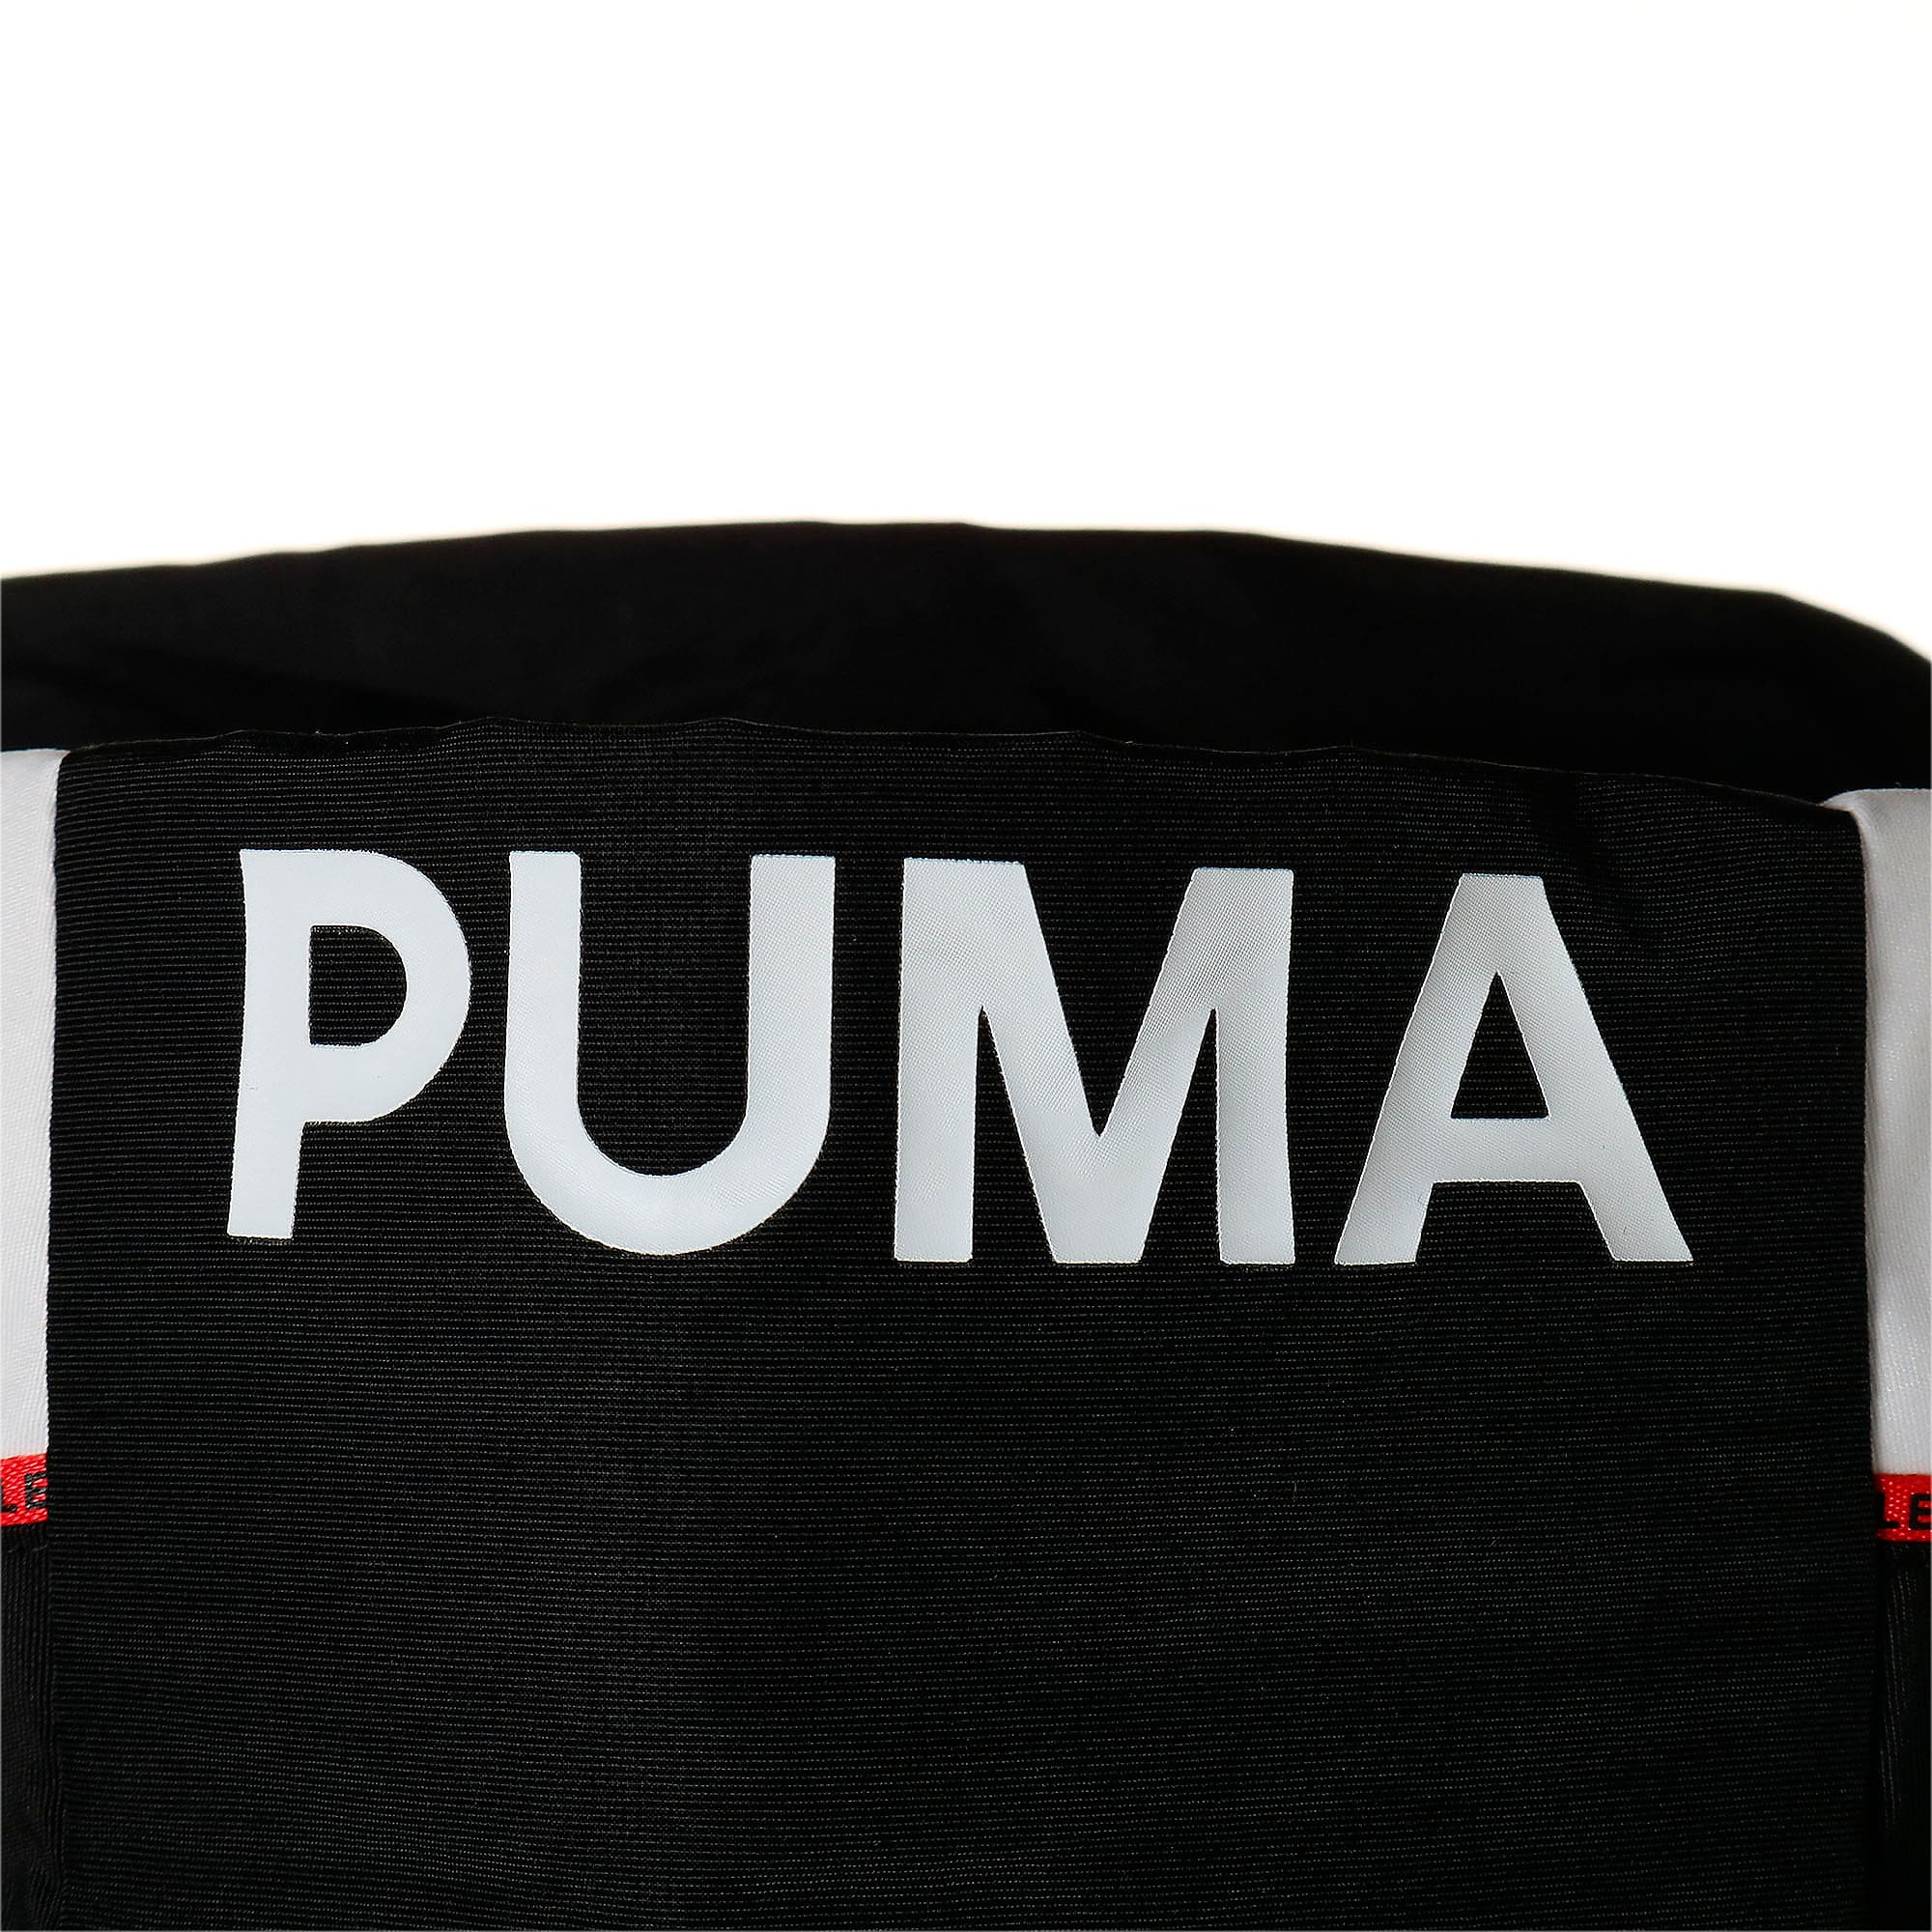 Thumbnail 14 of PUMA x LES BENJAMINS ストームジャケット, Puma White, medium-JPN